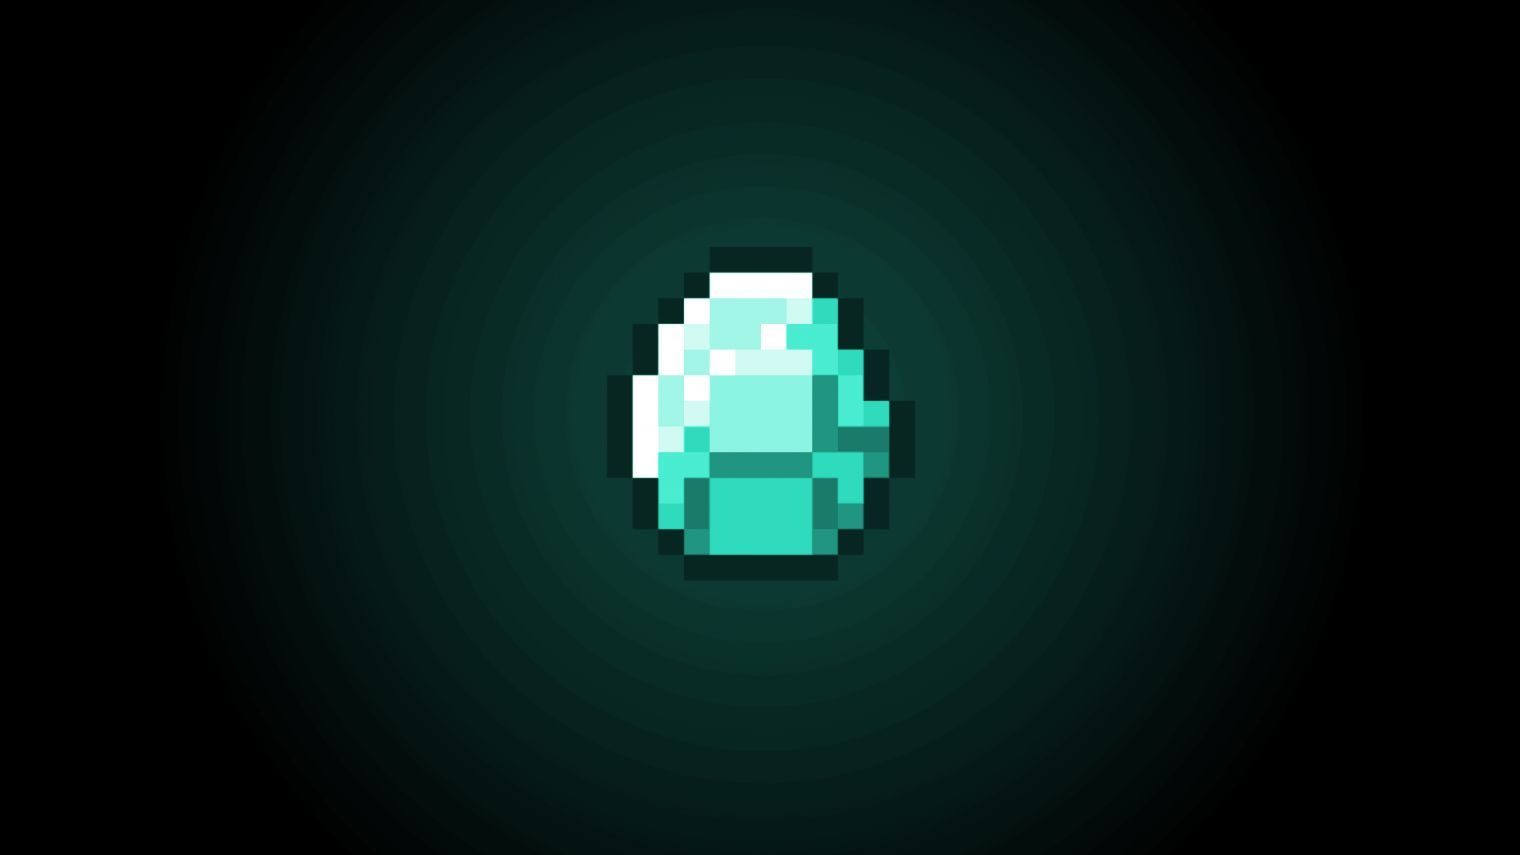 Minecraft Diamond Wallpapers Top Free Minecraft Diamond